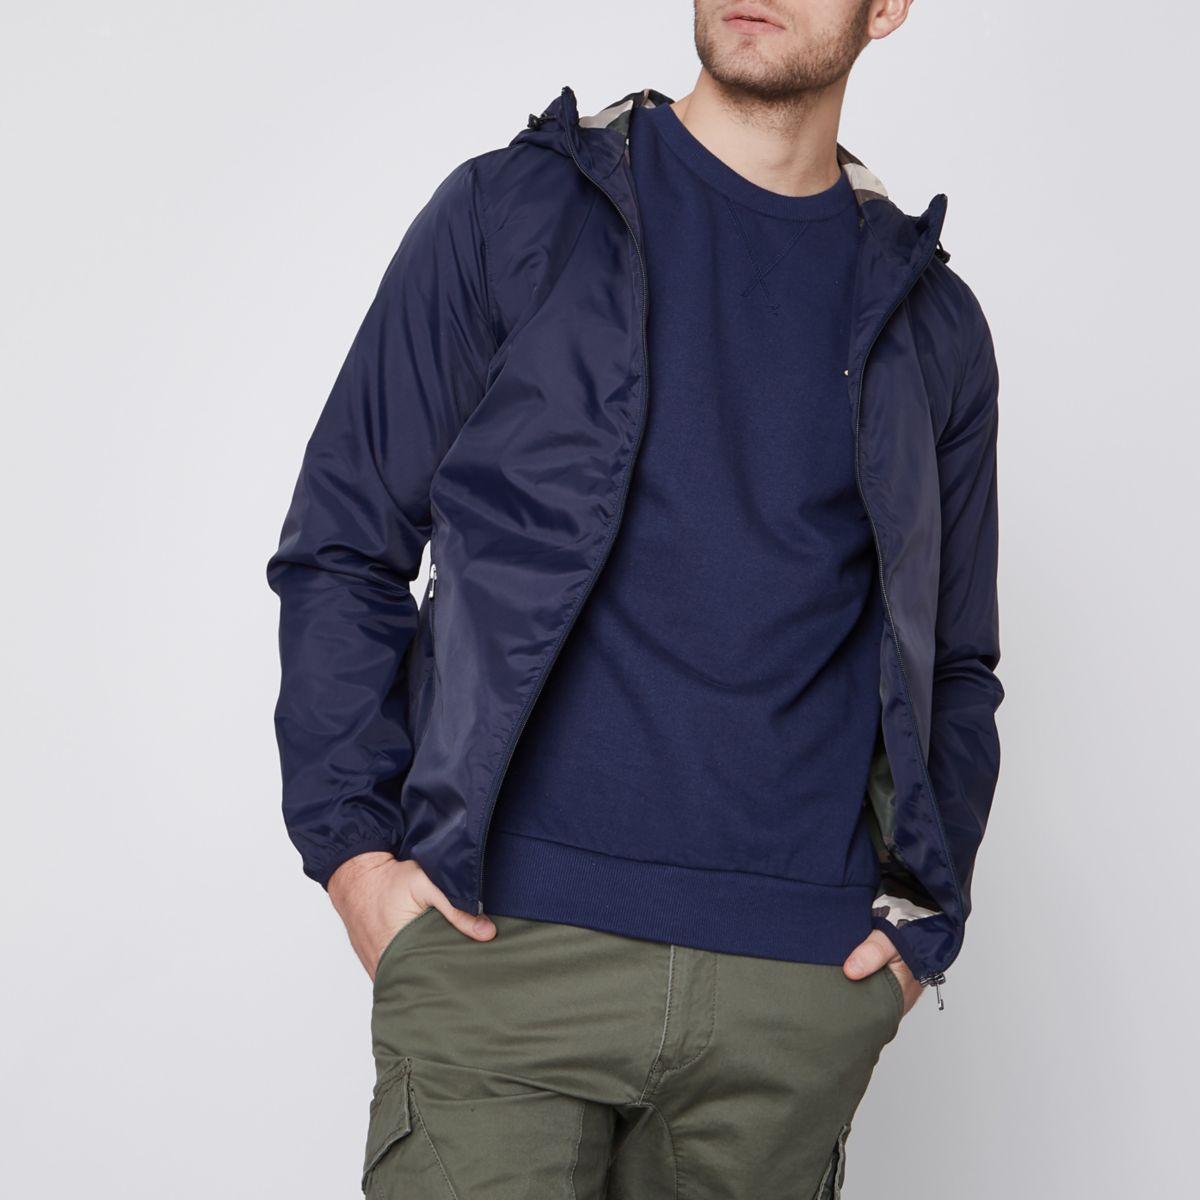 Navy Jack & Jones lightweight hooded jacket